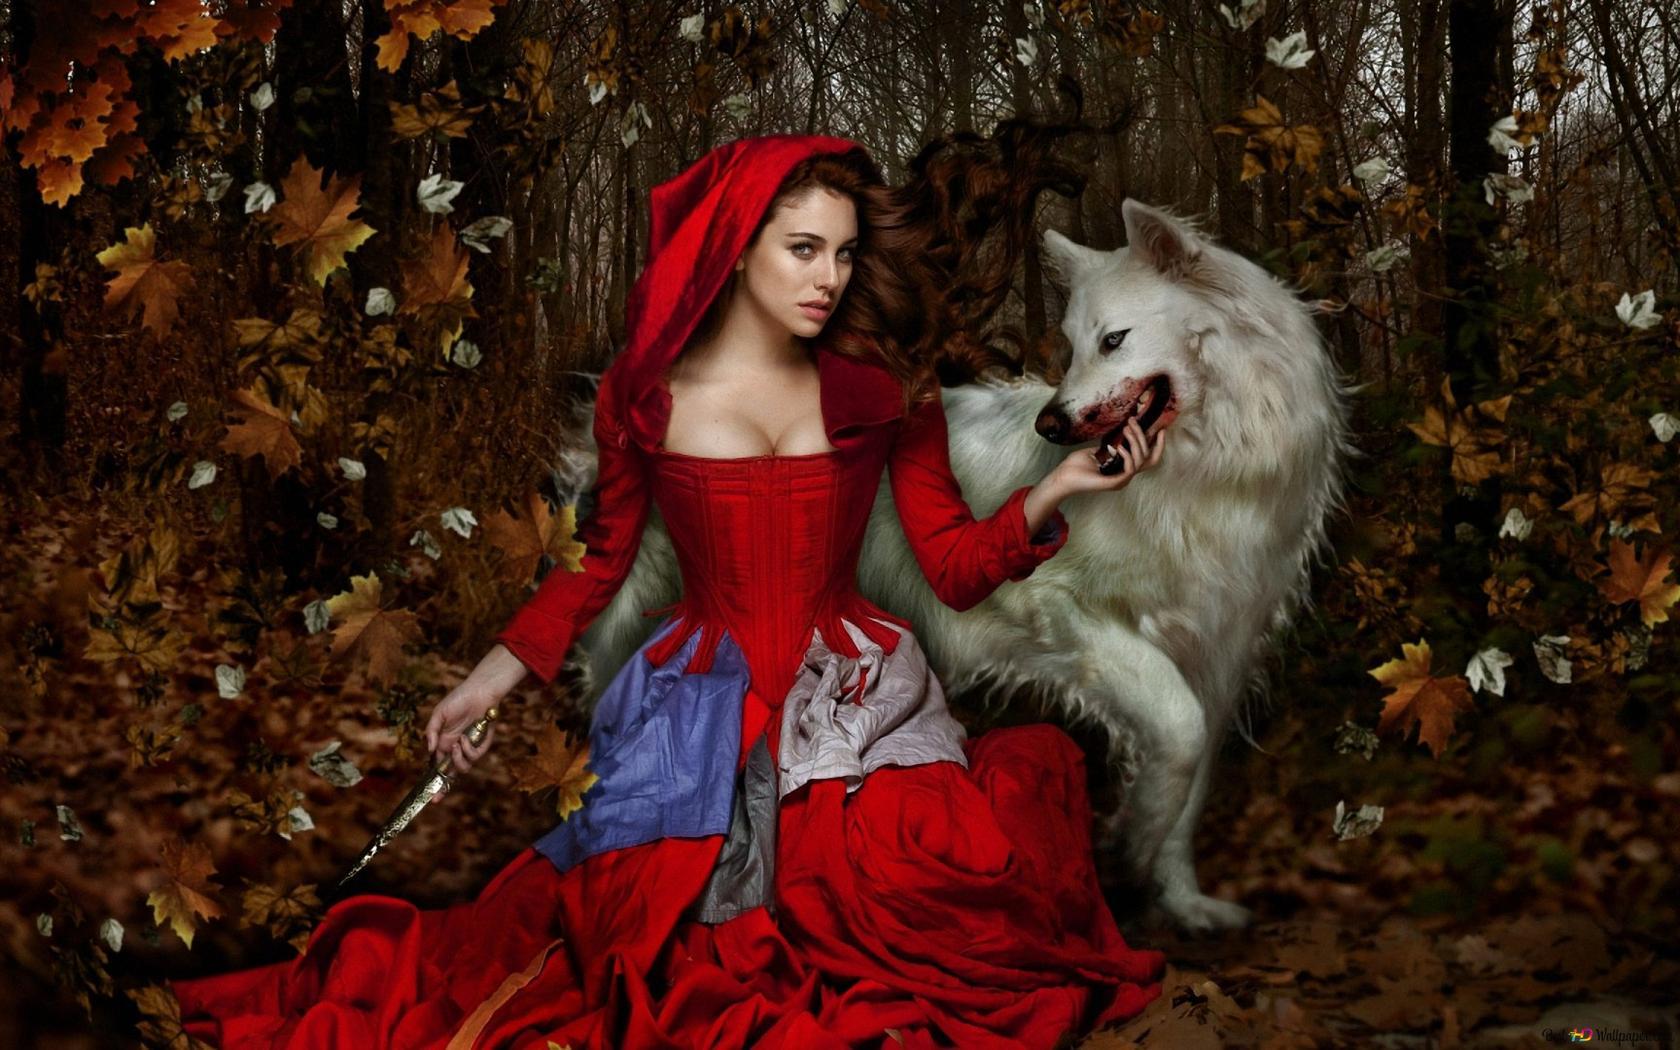 Verwonderend Roodkapje en de Wolf HD wallpaper downloaden HP-52